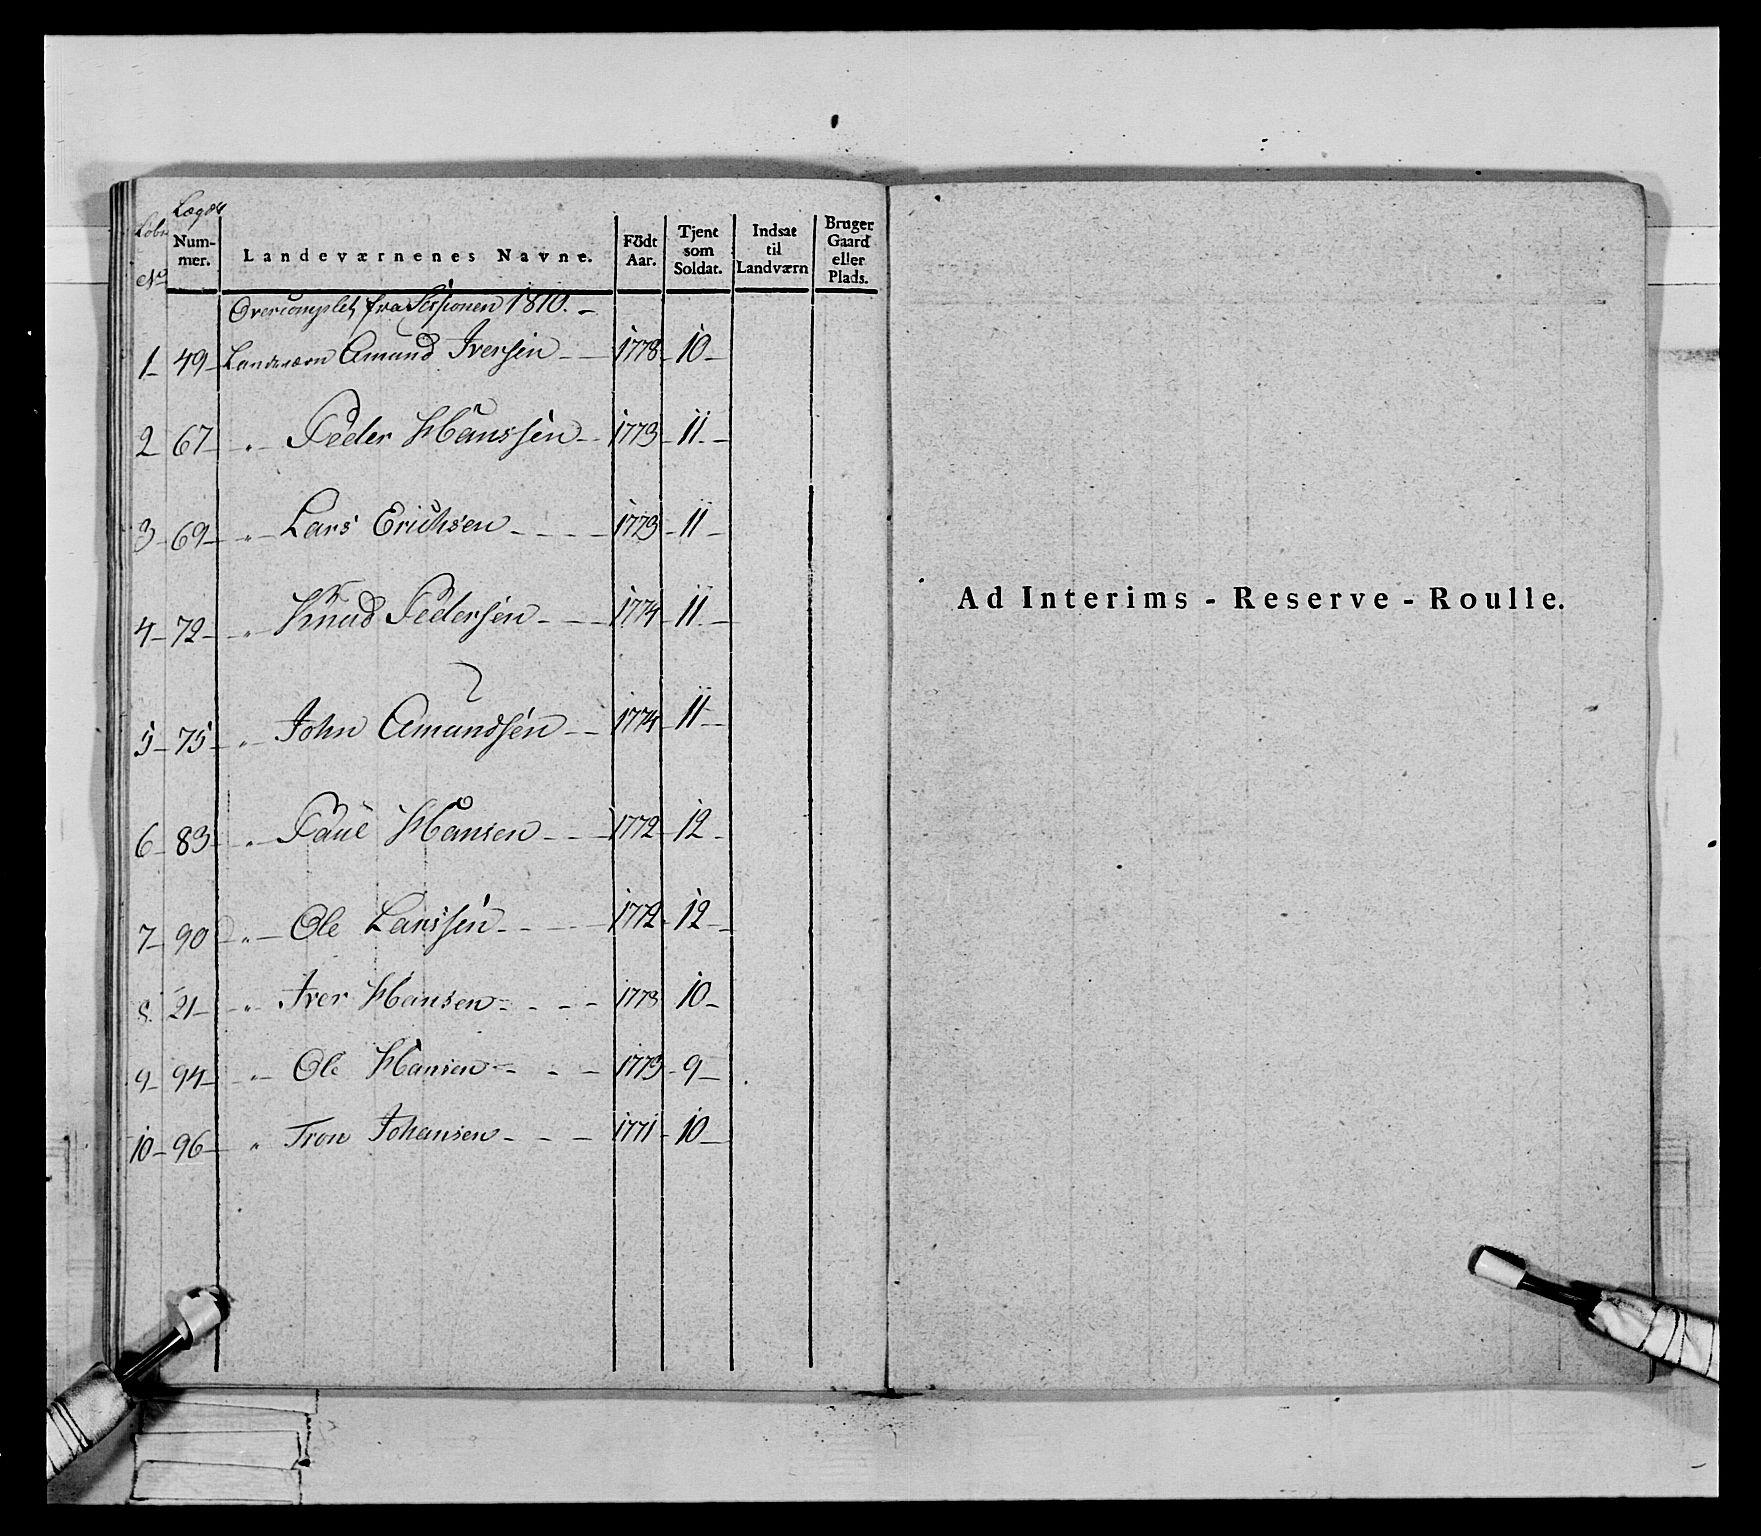 RA, Generalitets- og kommissariatskollegiet, Det kongelige norske kommissariatskollegium, E/Eh/L0069: Opplandske gevorbne infanteriregiment, 1810-1818, s. 603